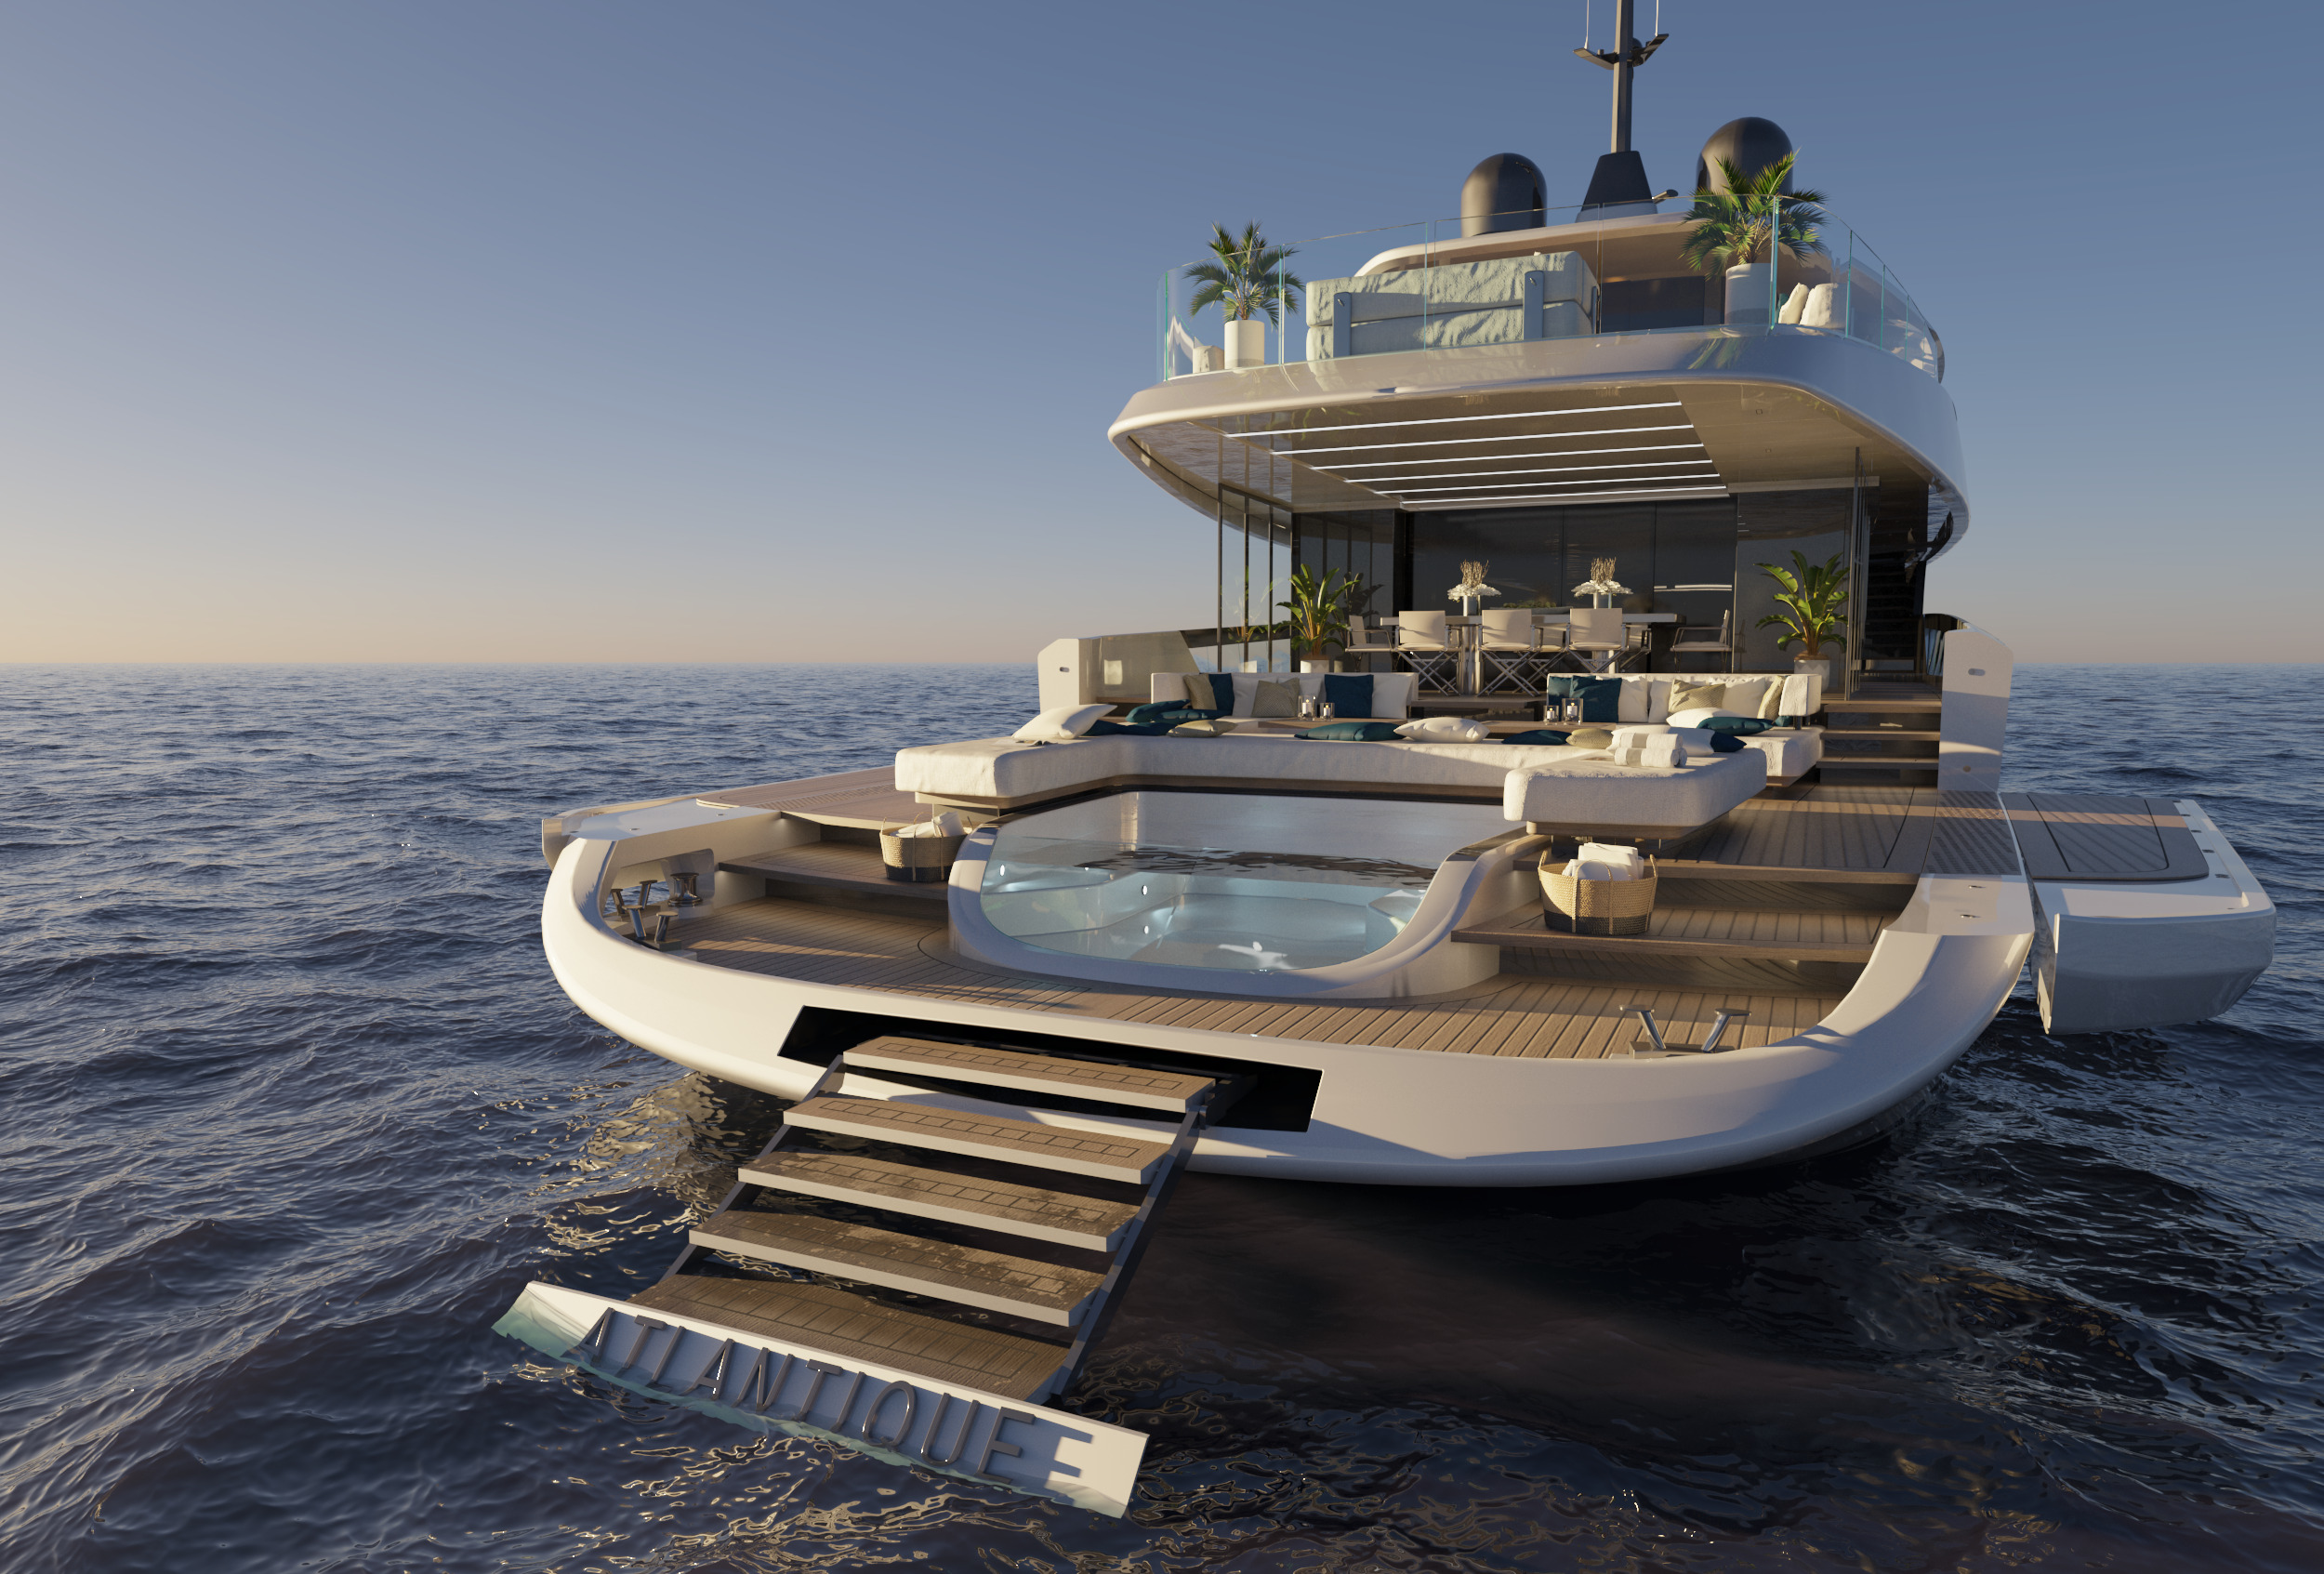 columbus-atlantique-boat-shopping-2